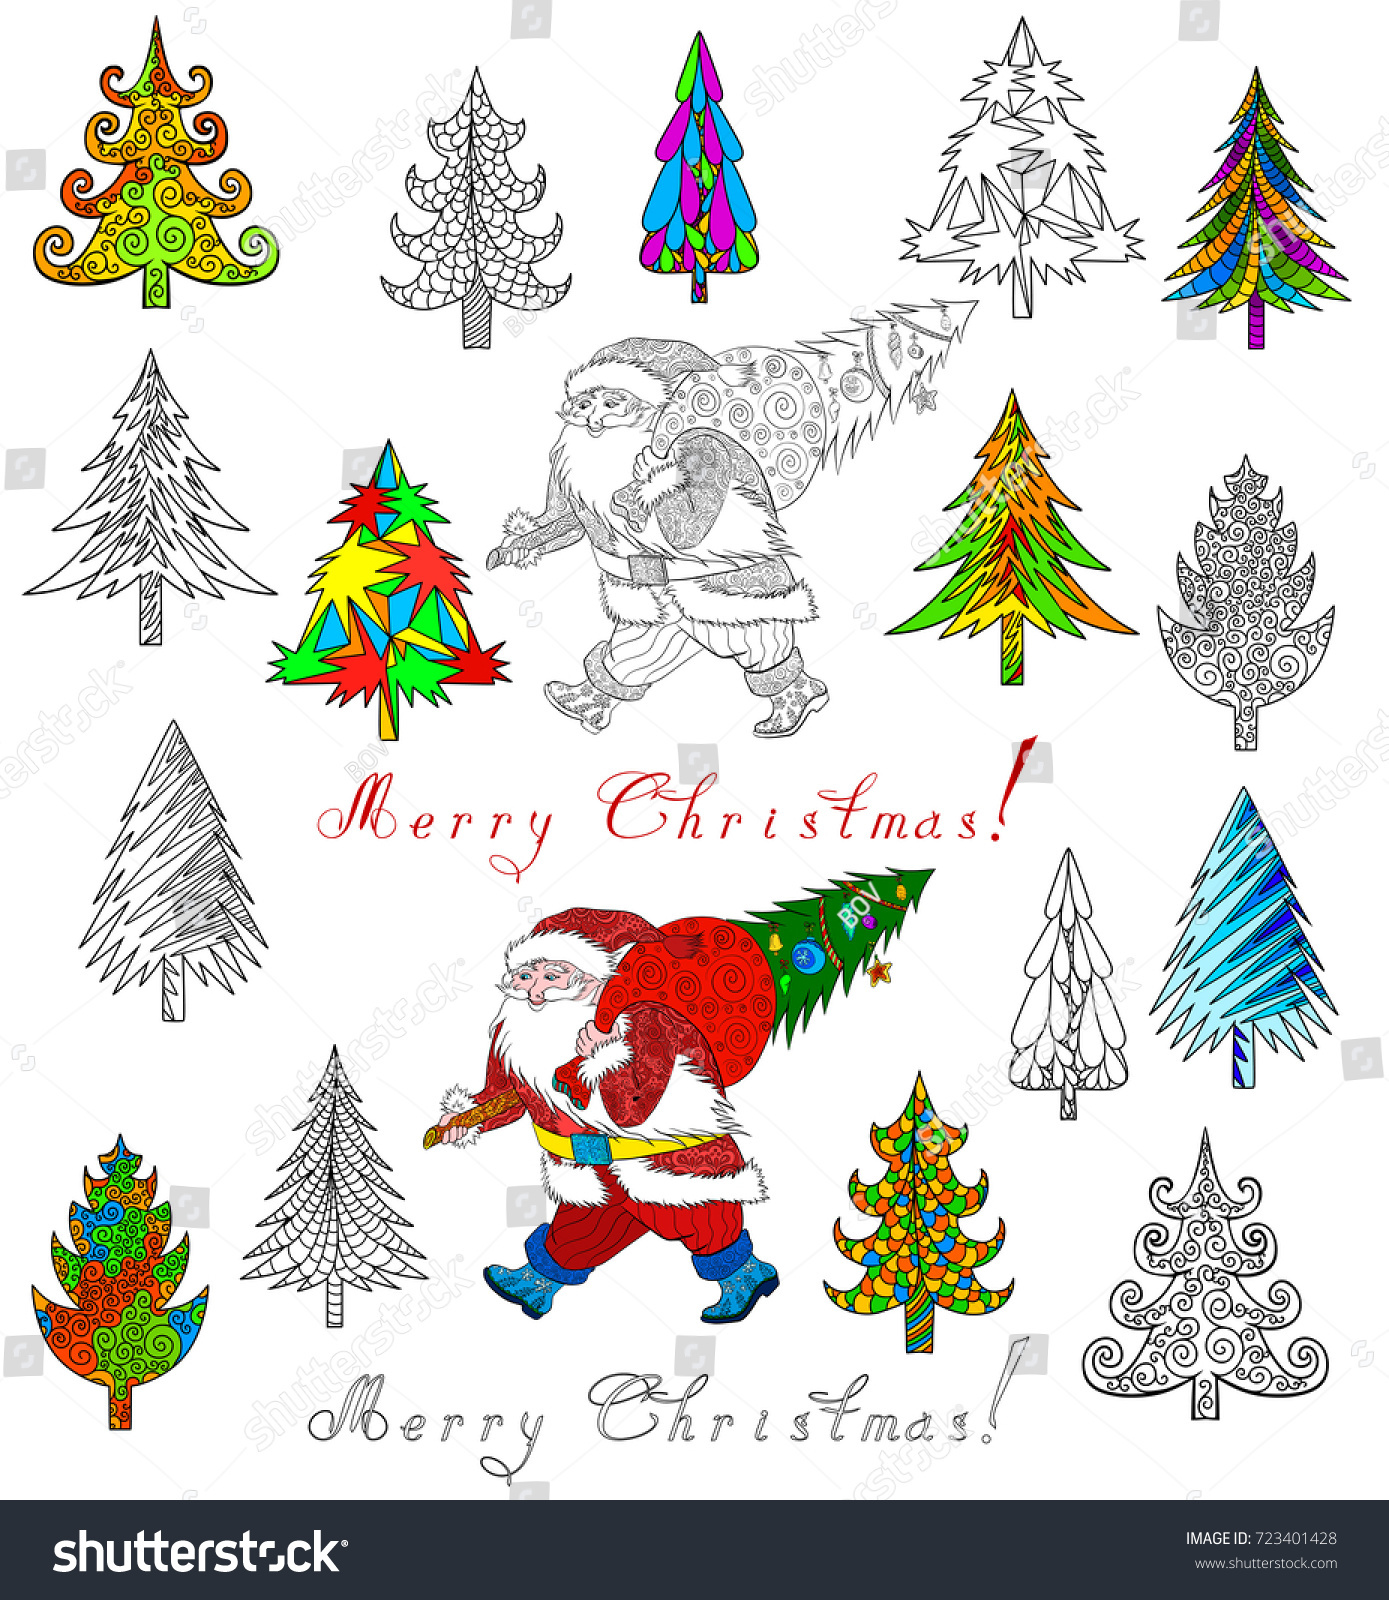 Christmas Tree Santa Claus Doodle Coloring Stock Vector Royalty